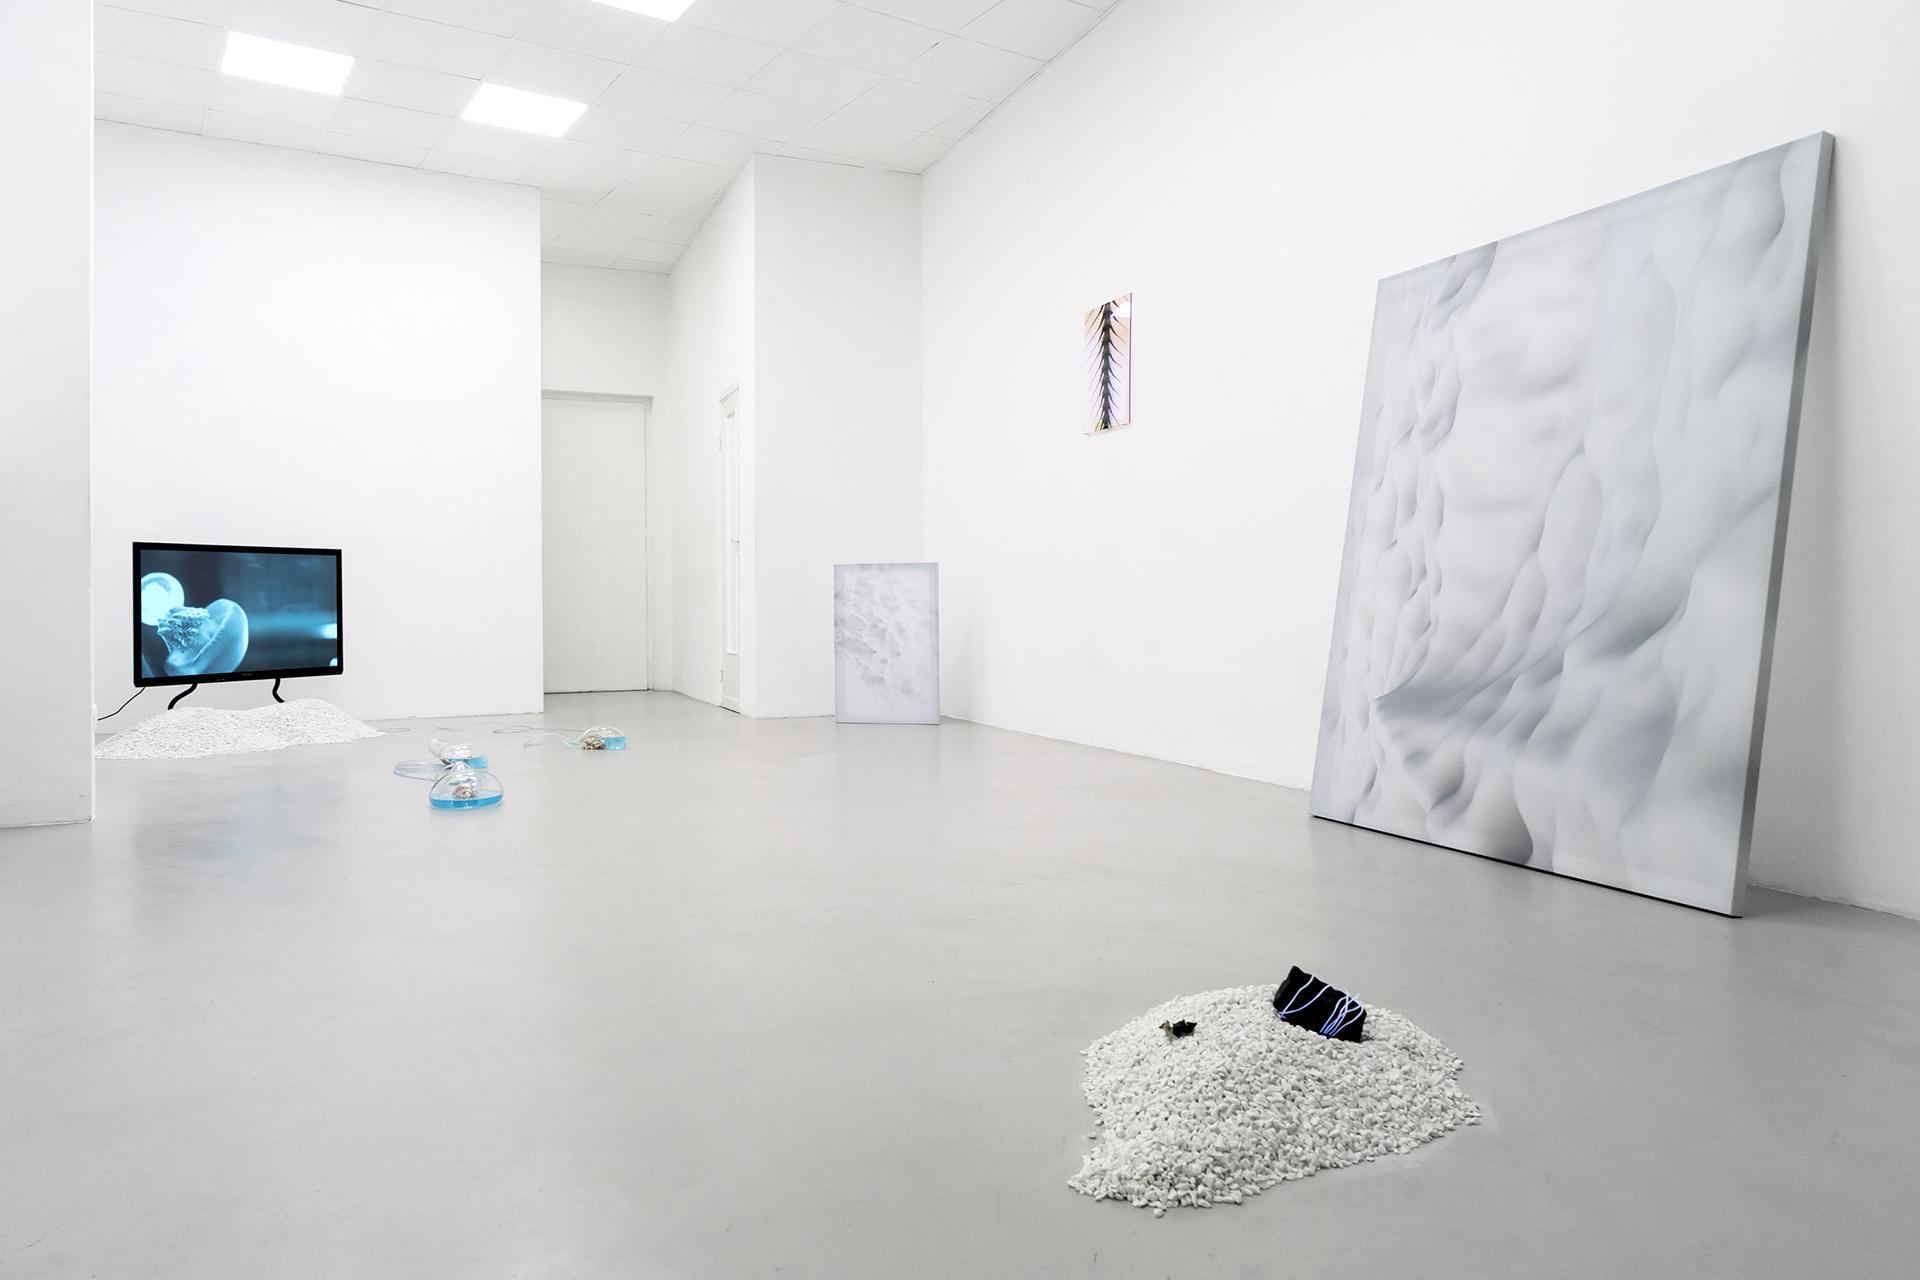 1-Paulo-Arraiano,-Sensorial-Divinities.-2019.-Exhibition-view.-Dimora-Artica-(ph-Cesare-Lopopolo).jpg